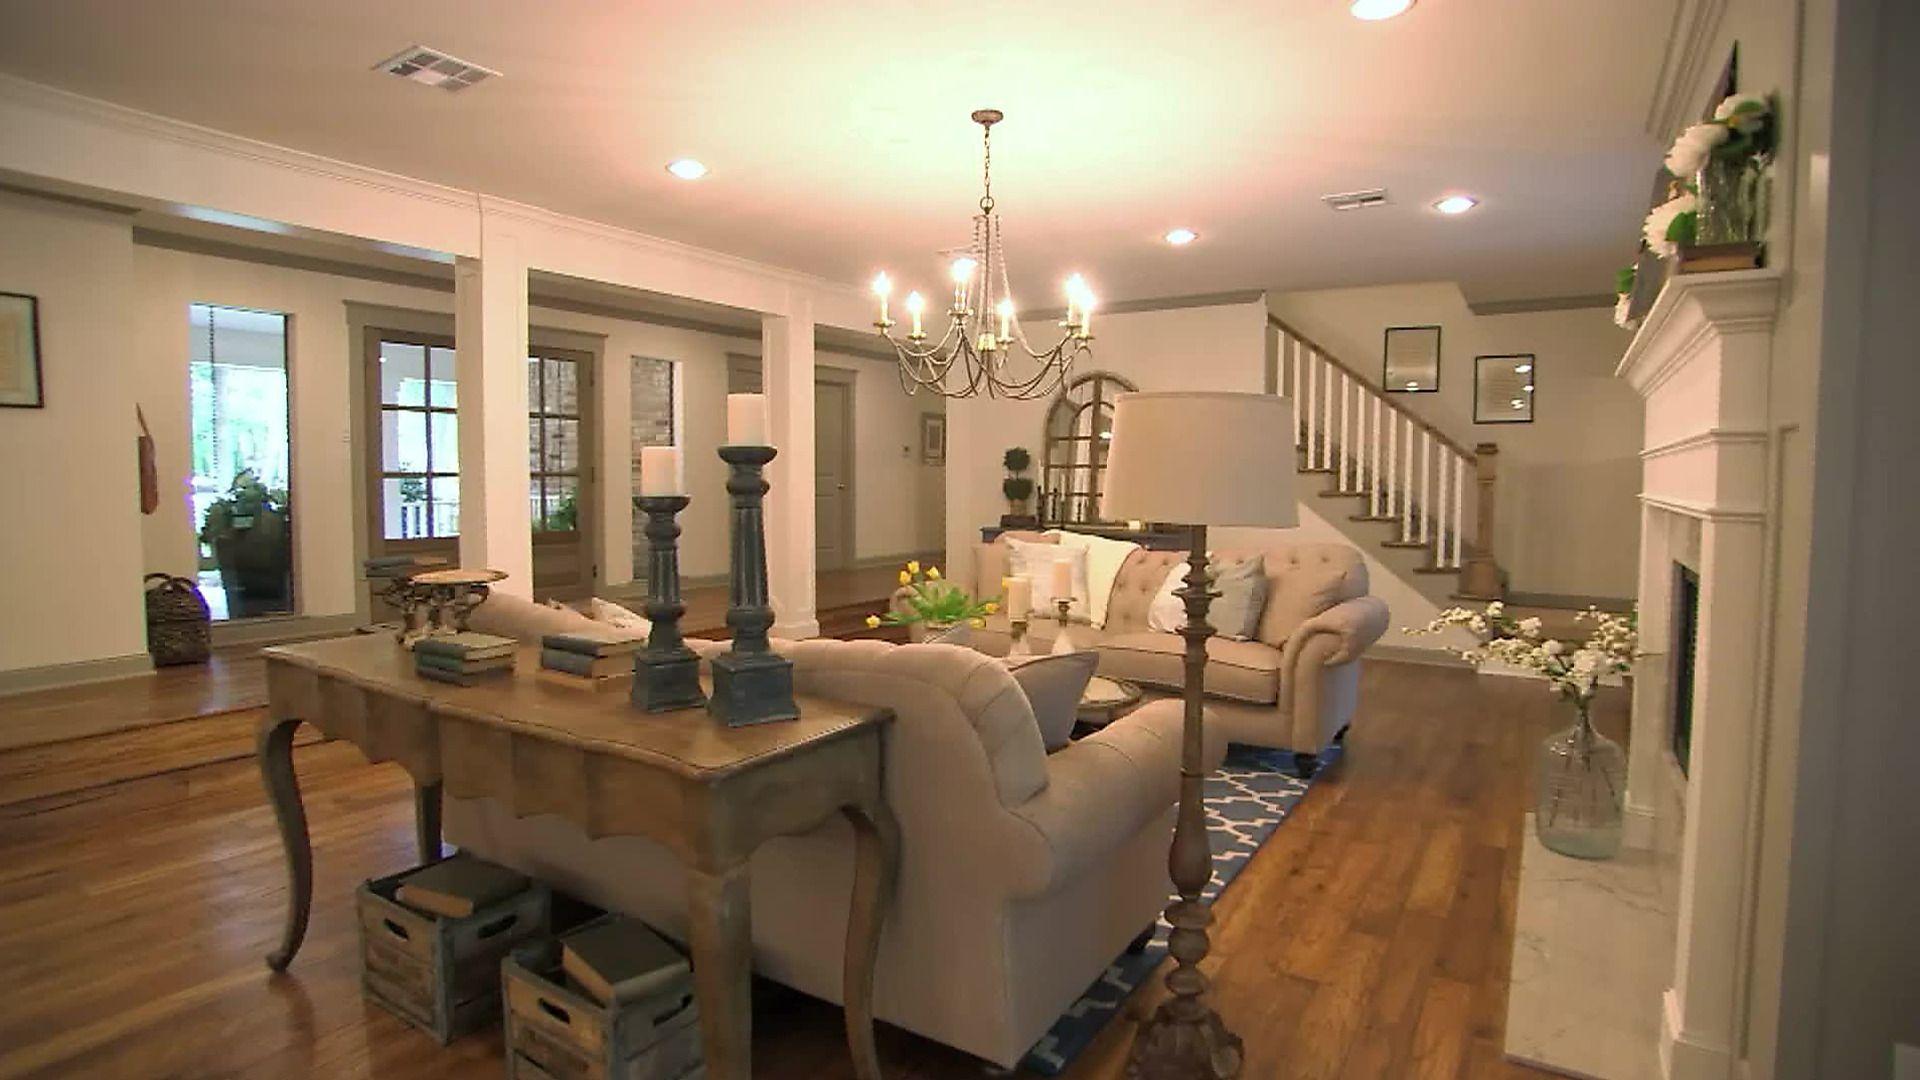 Hgtv Design Ideas Living Room Web Exclusive Joanna's Design Tips  The Ferguson Project